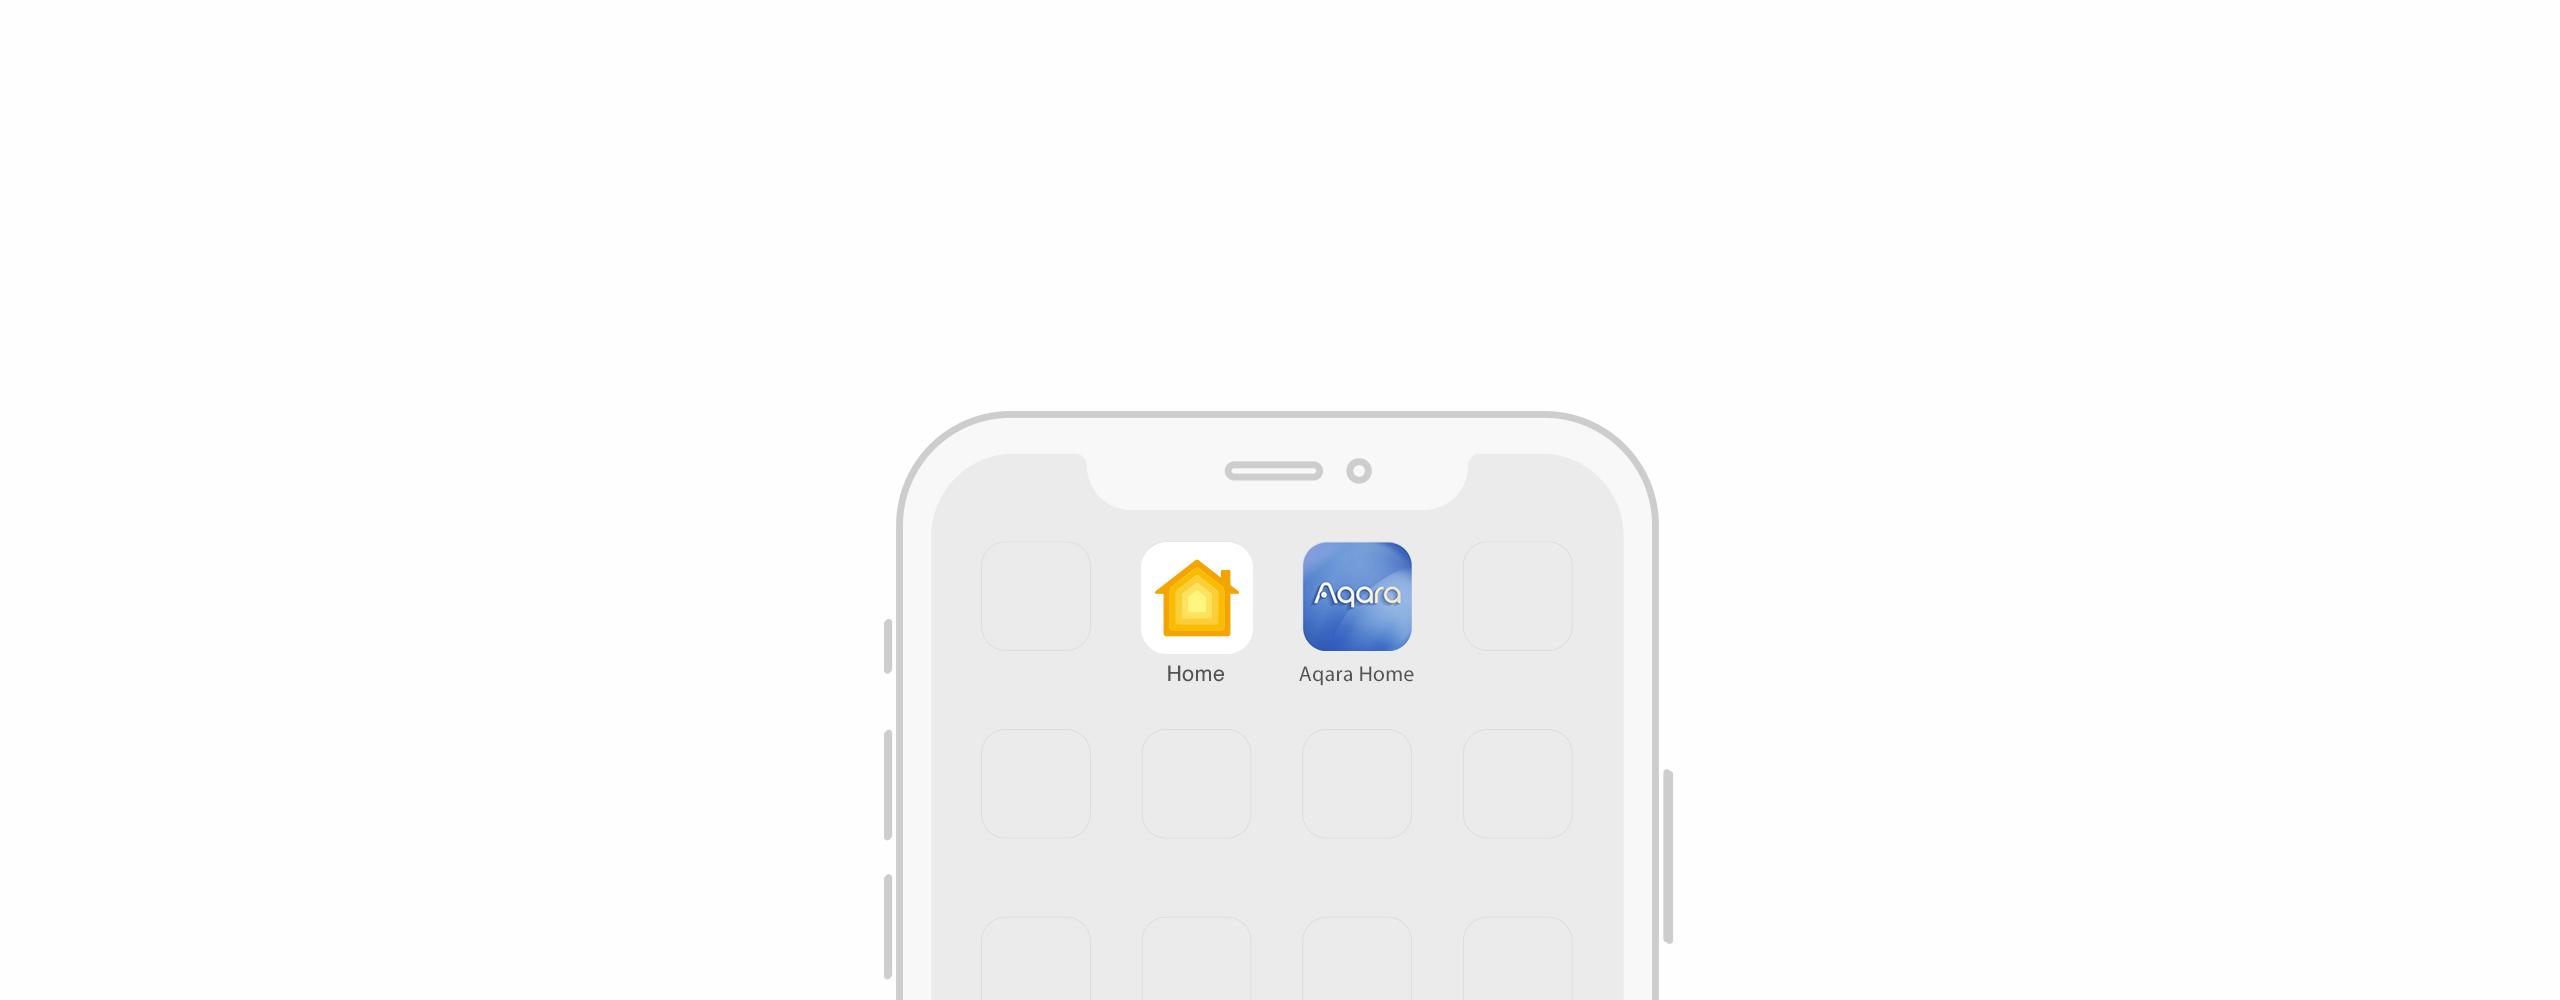 Aqara wireless water sensor works with Apple HomeKit and Xiaomi Mijia